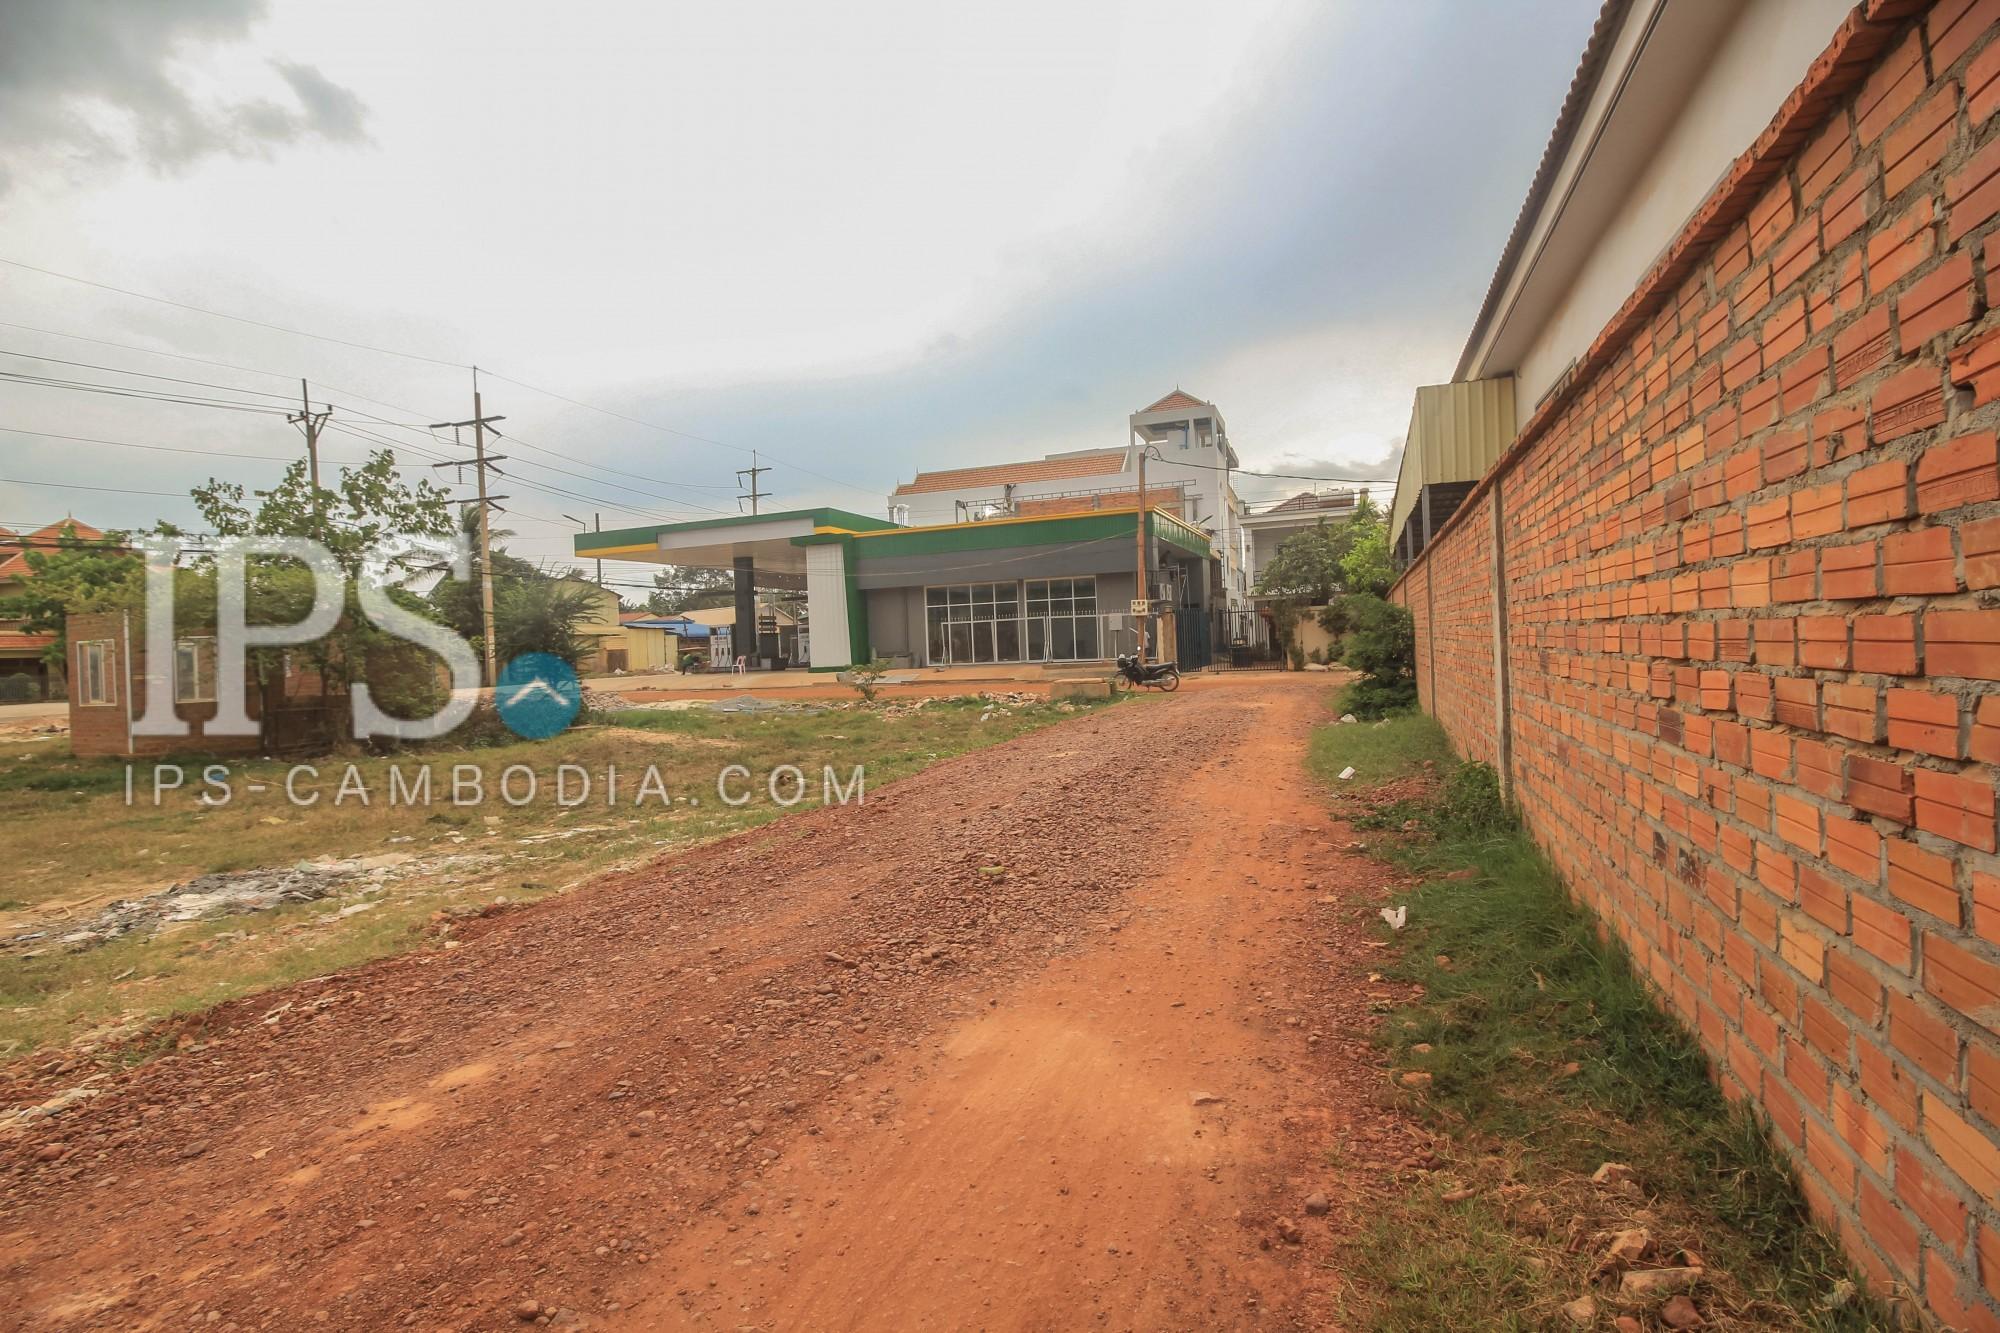 Hard Titled Residential Land For Sale - Svay Dangkum, Siem Reap